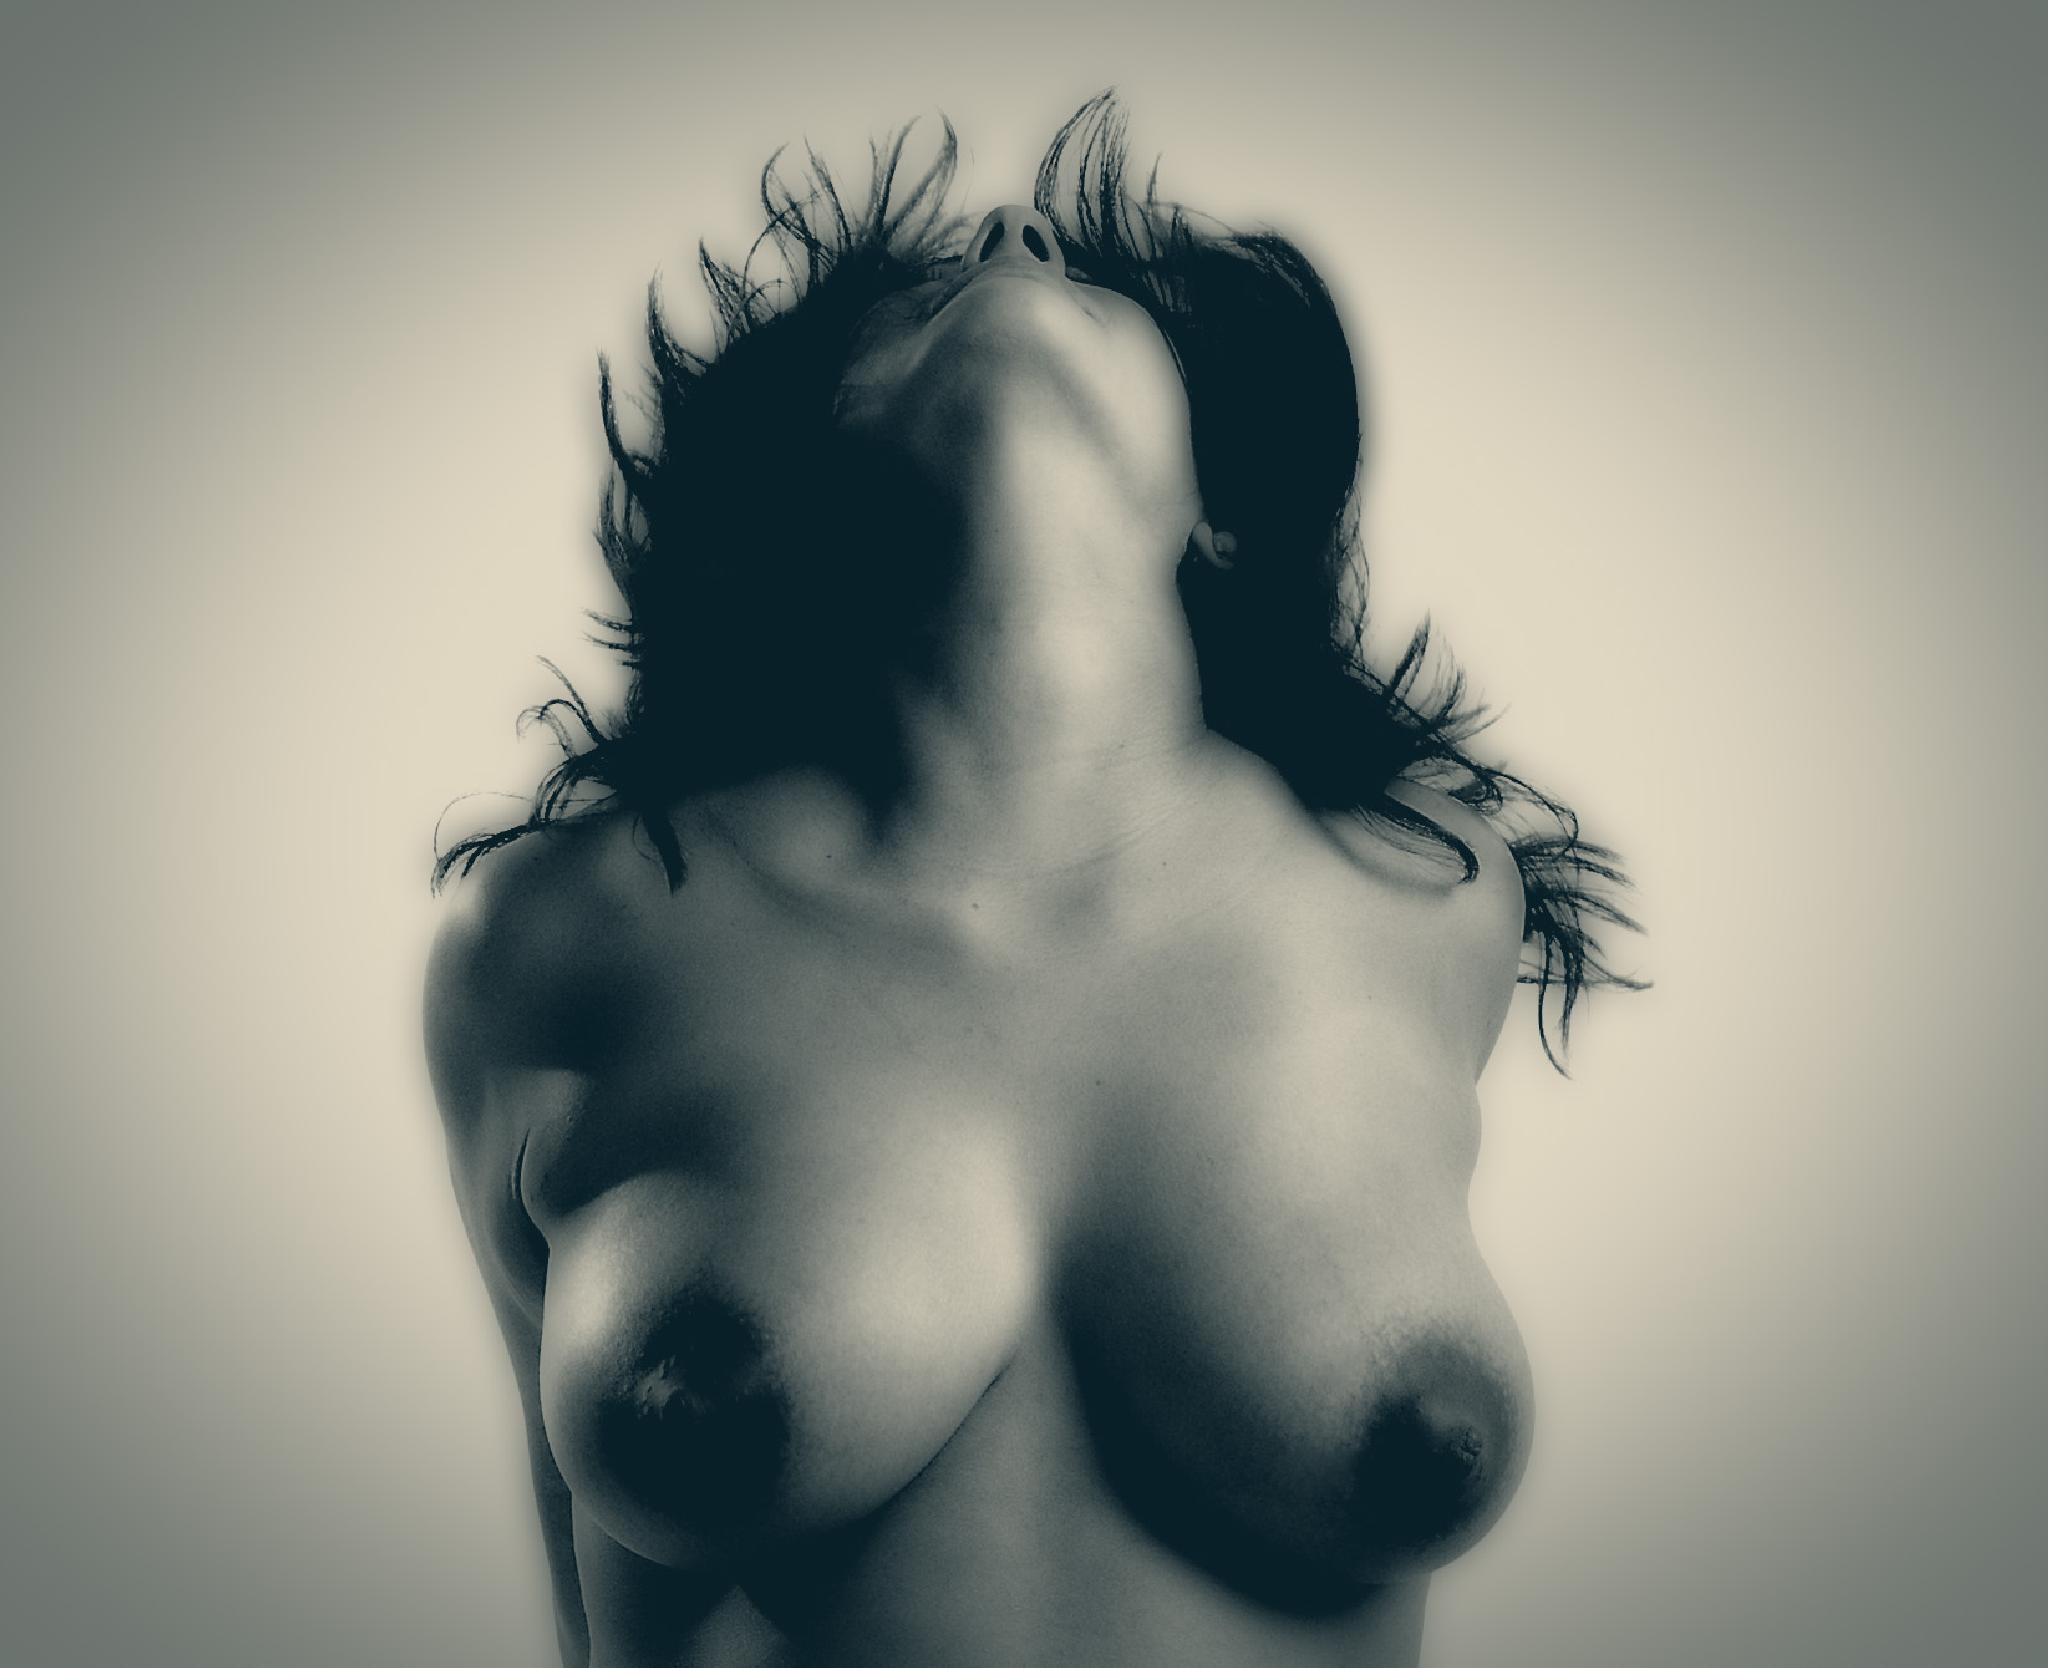 Pinhole boobs by Pixforce